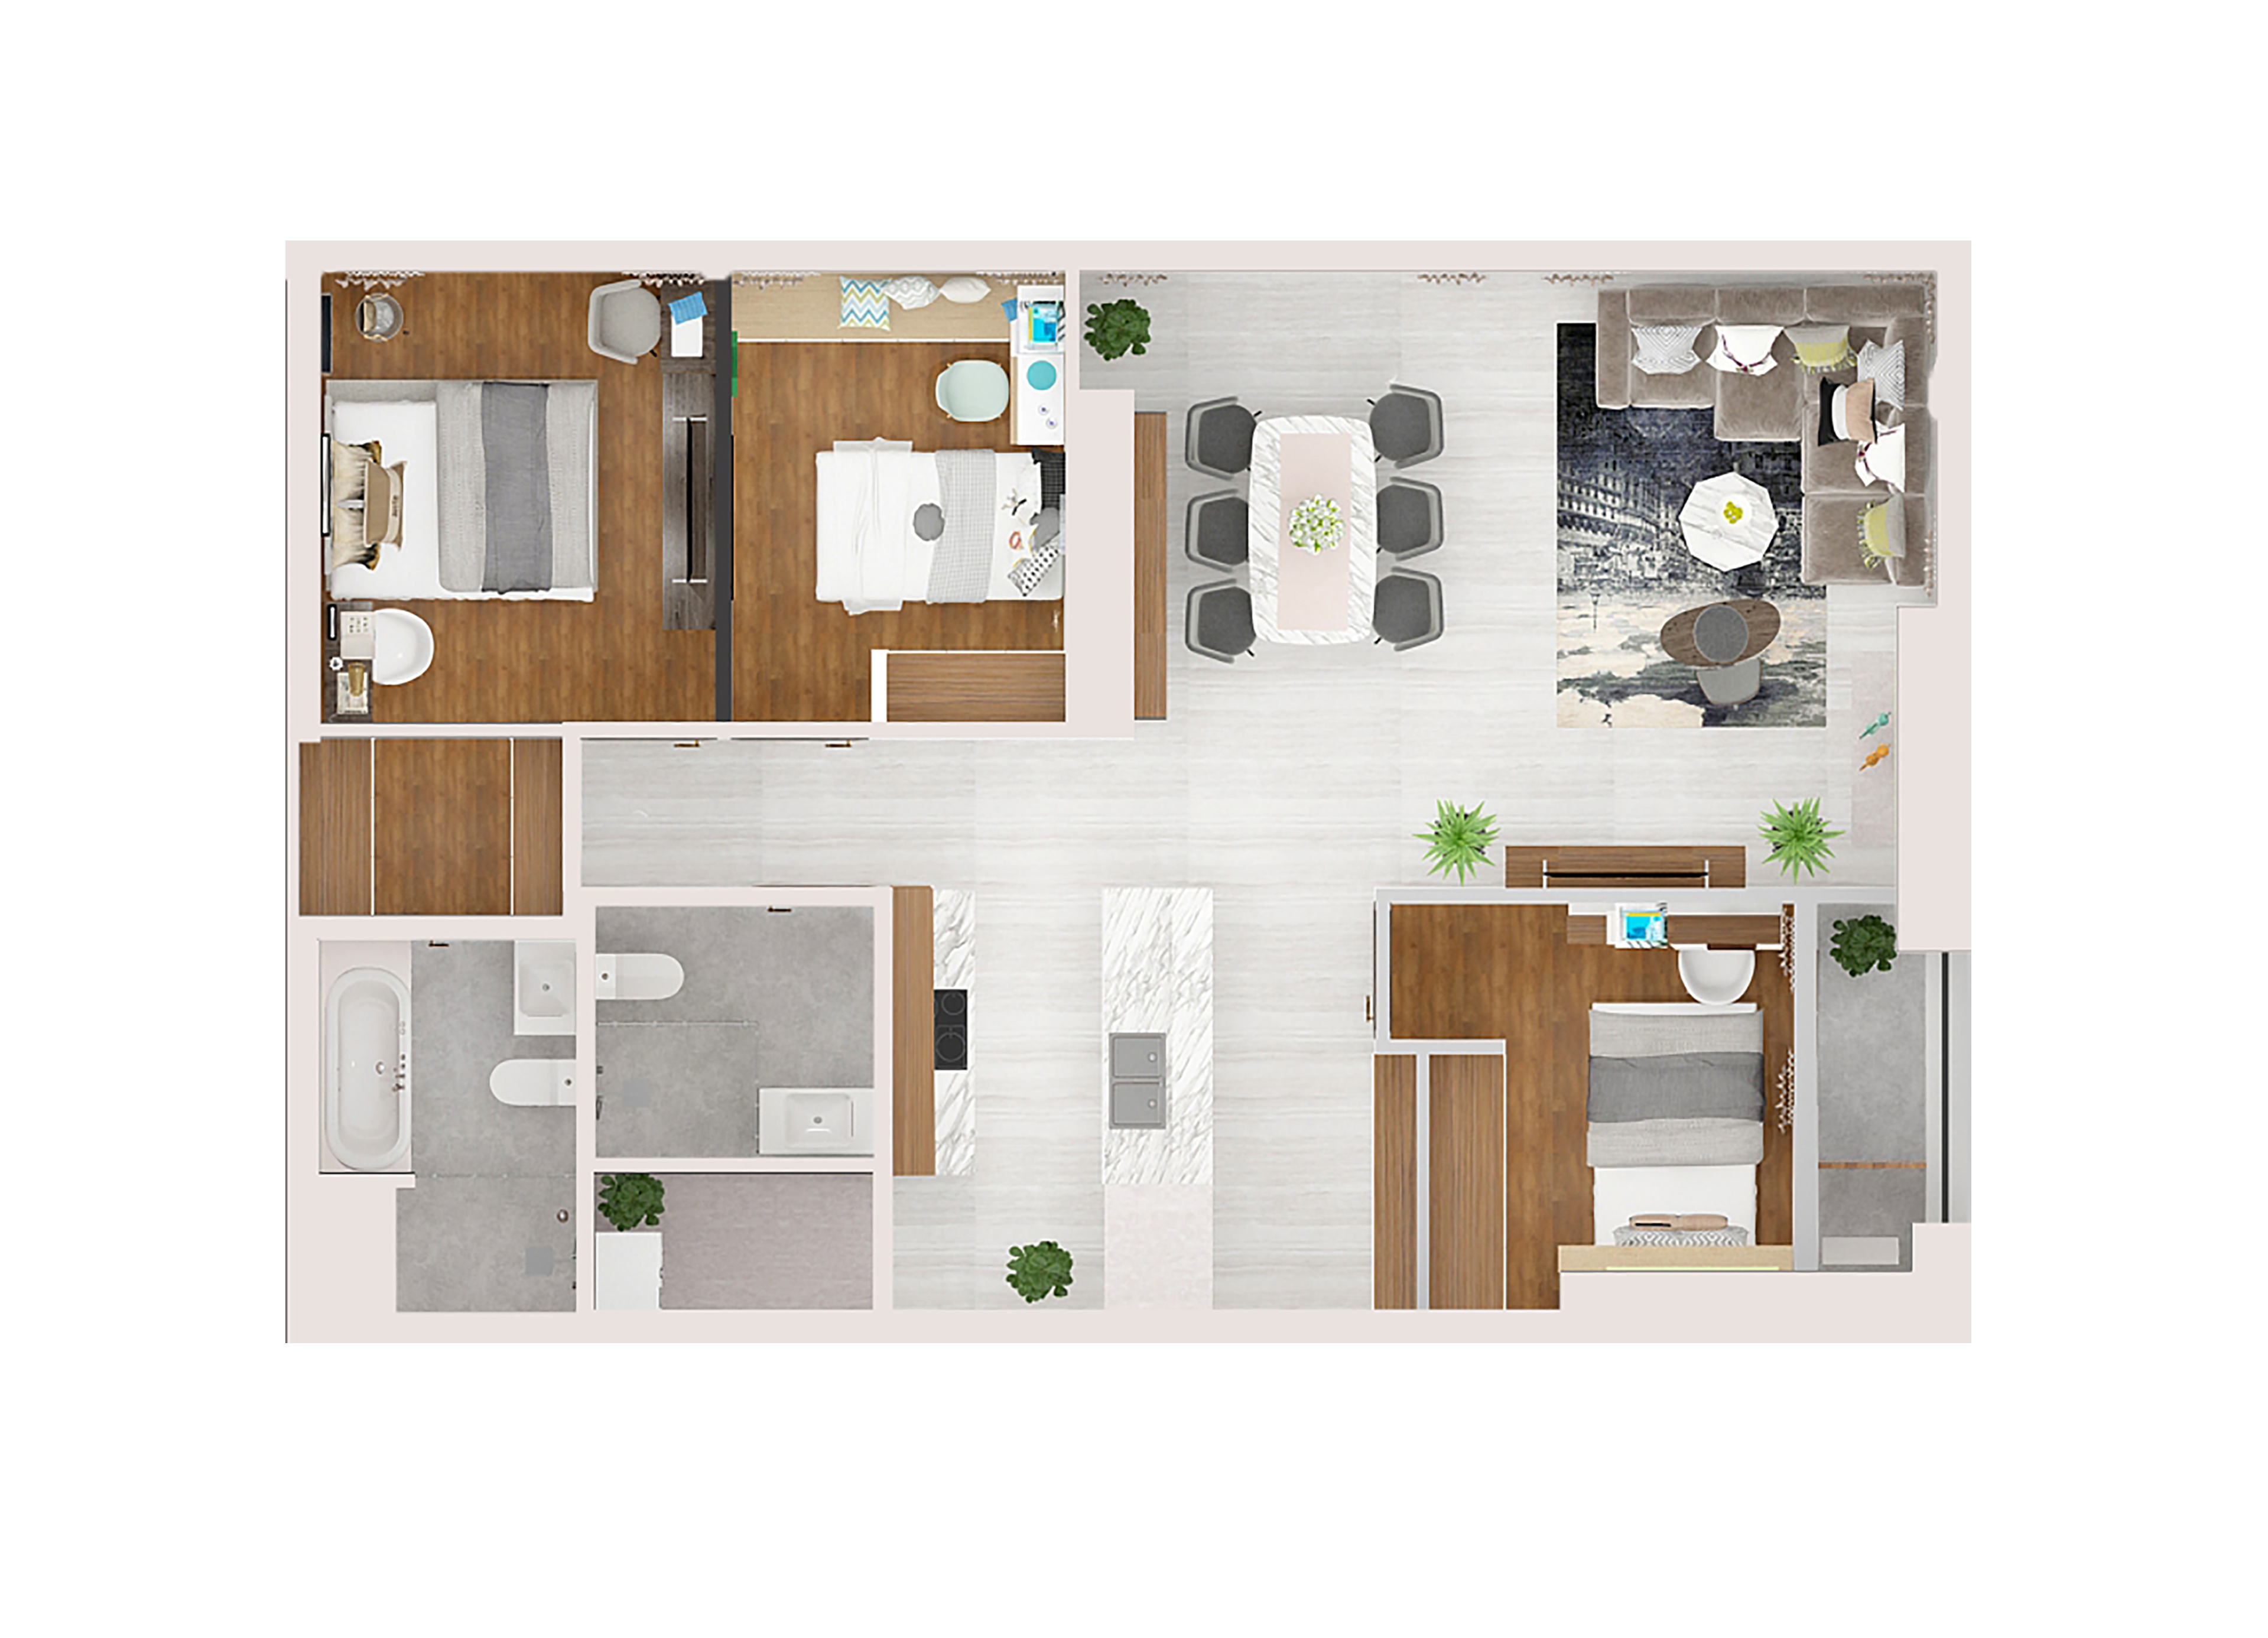 Mẫu căn hộ Kingdom 101 diện tích 102m2